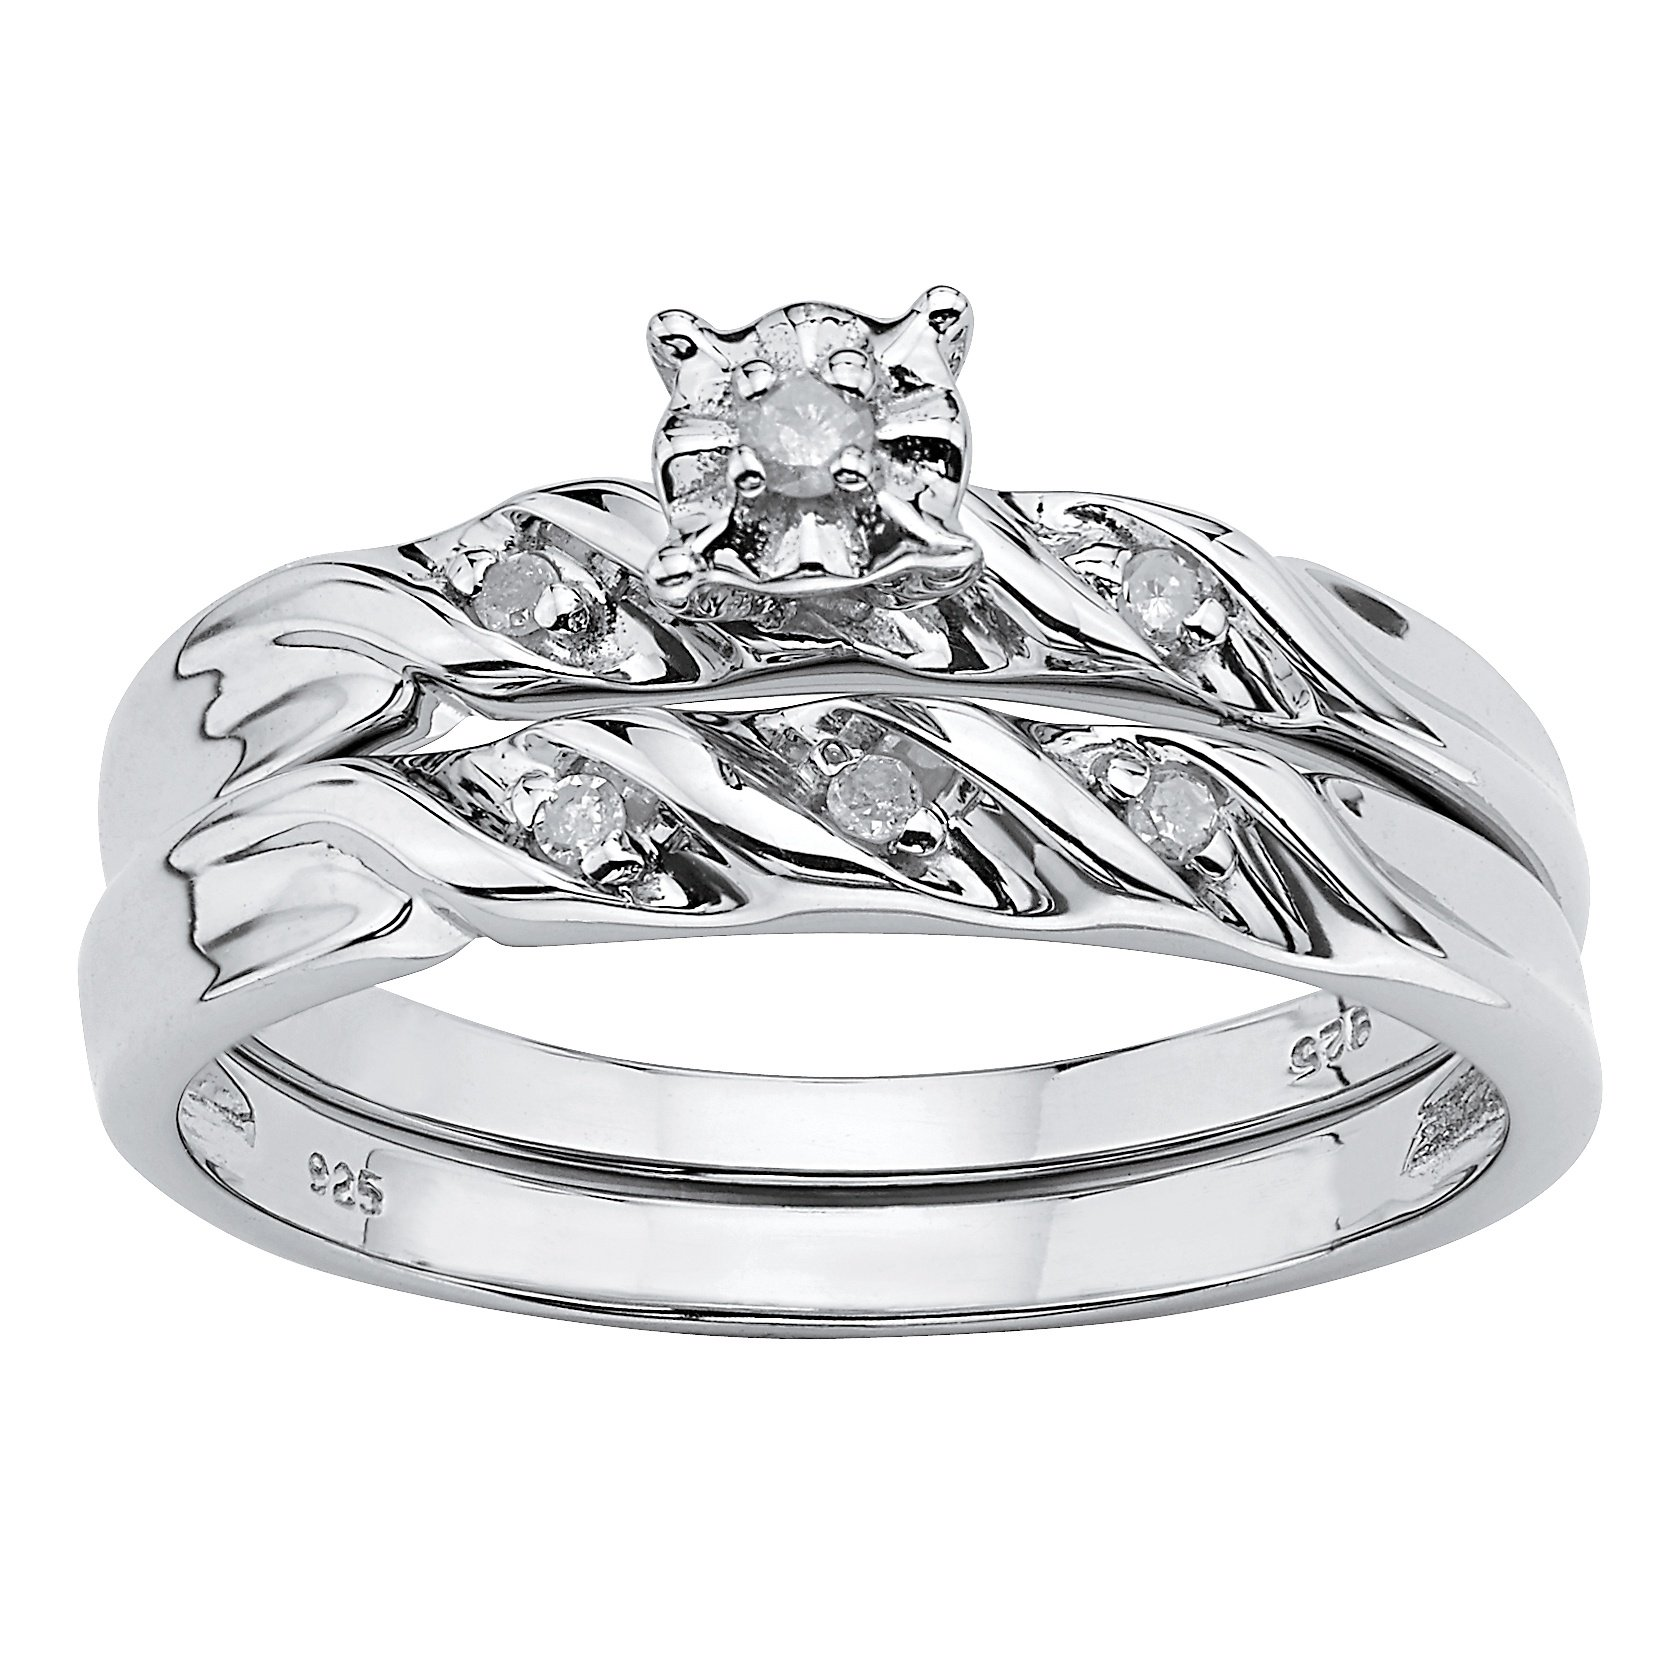 White Diamond Accent Platinum over .925 Sterling Silver 2-Piece Bridal Set Size 5